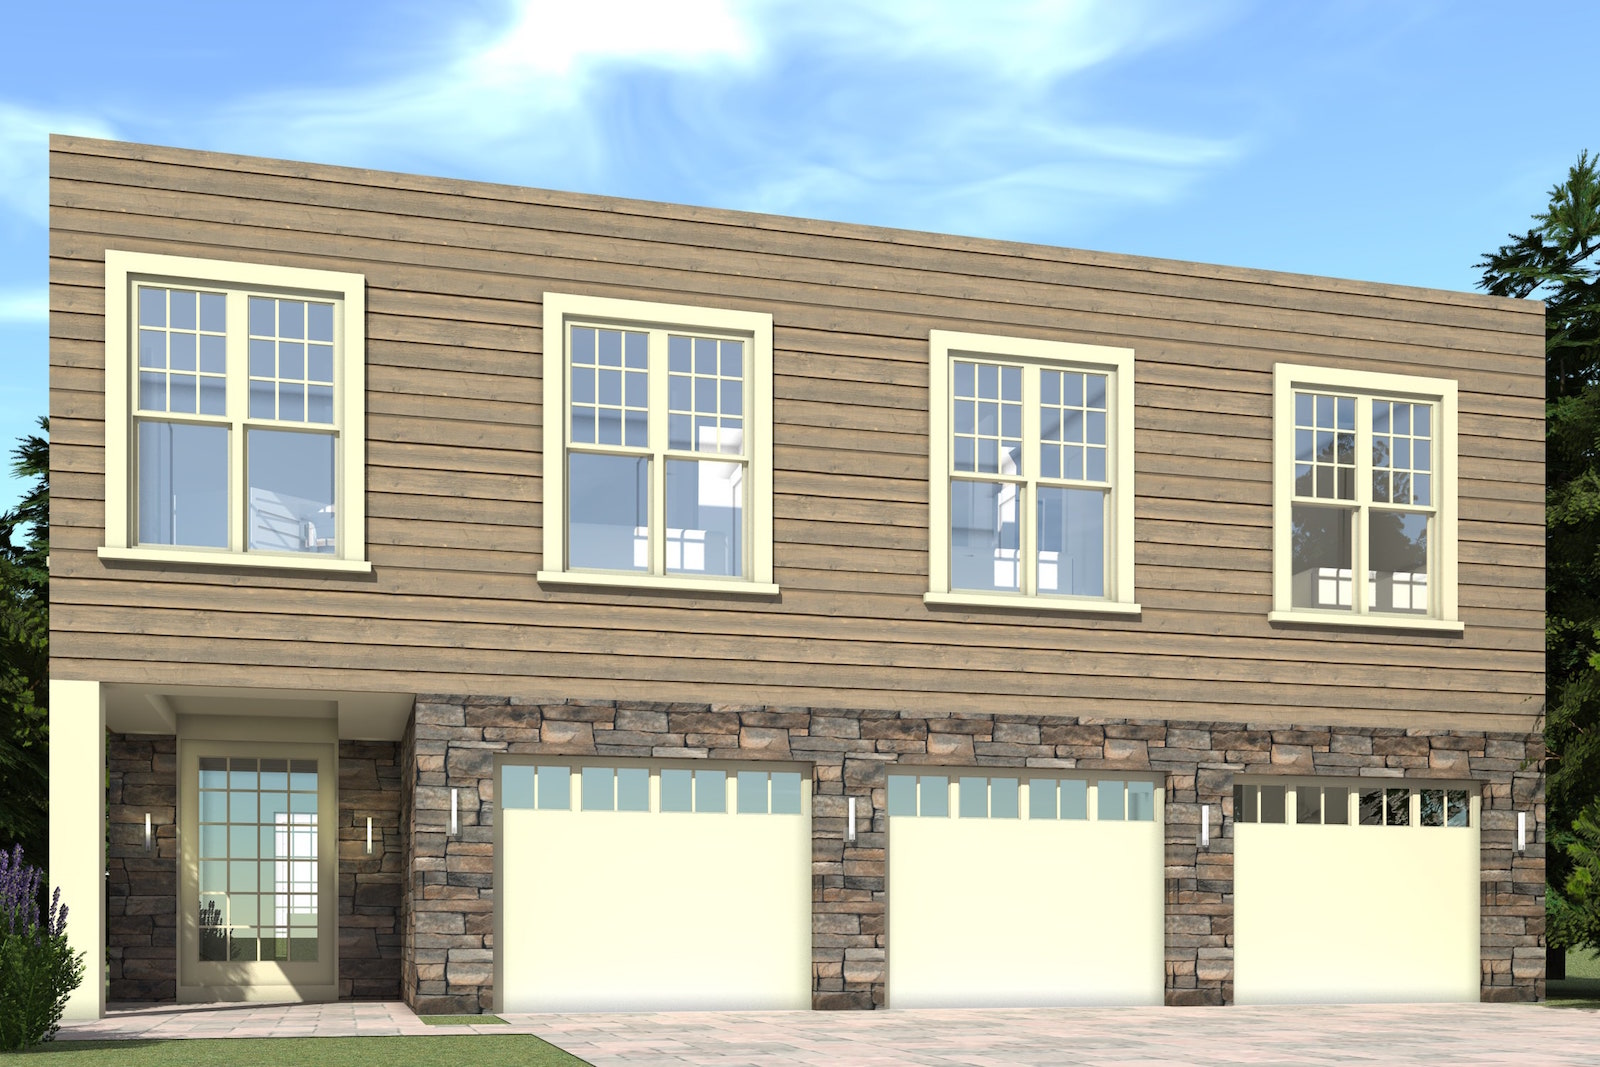 5 Bedrm 3000 Sq Ft Modern House Plan 116 1018